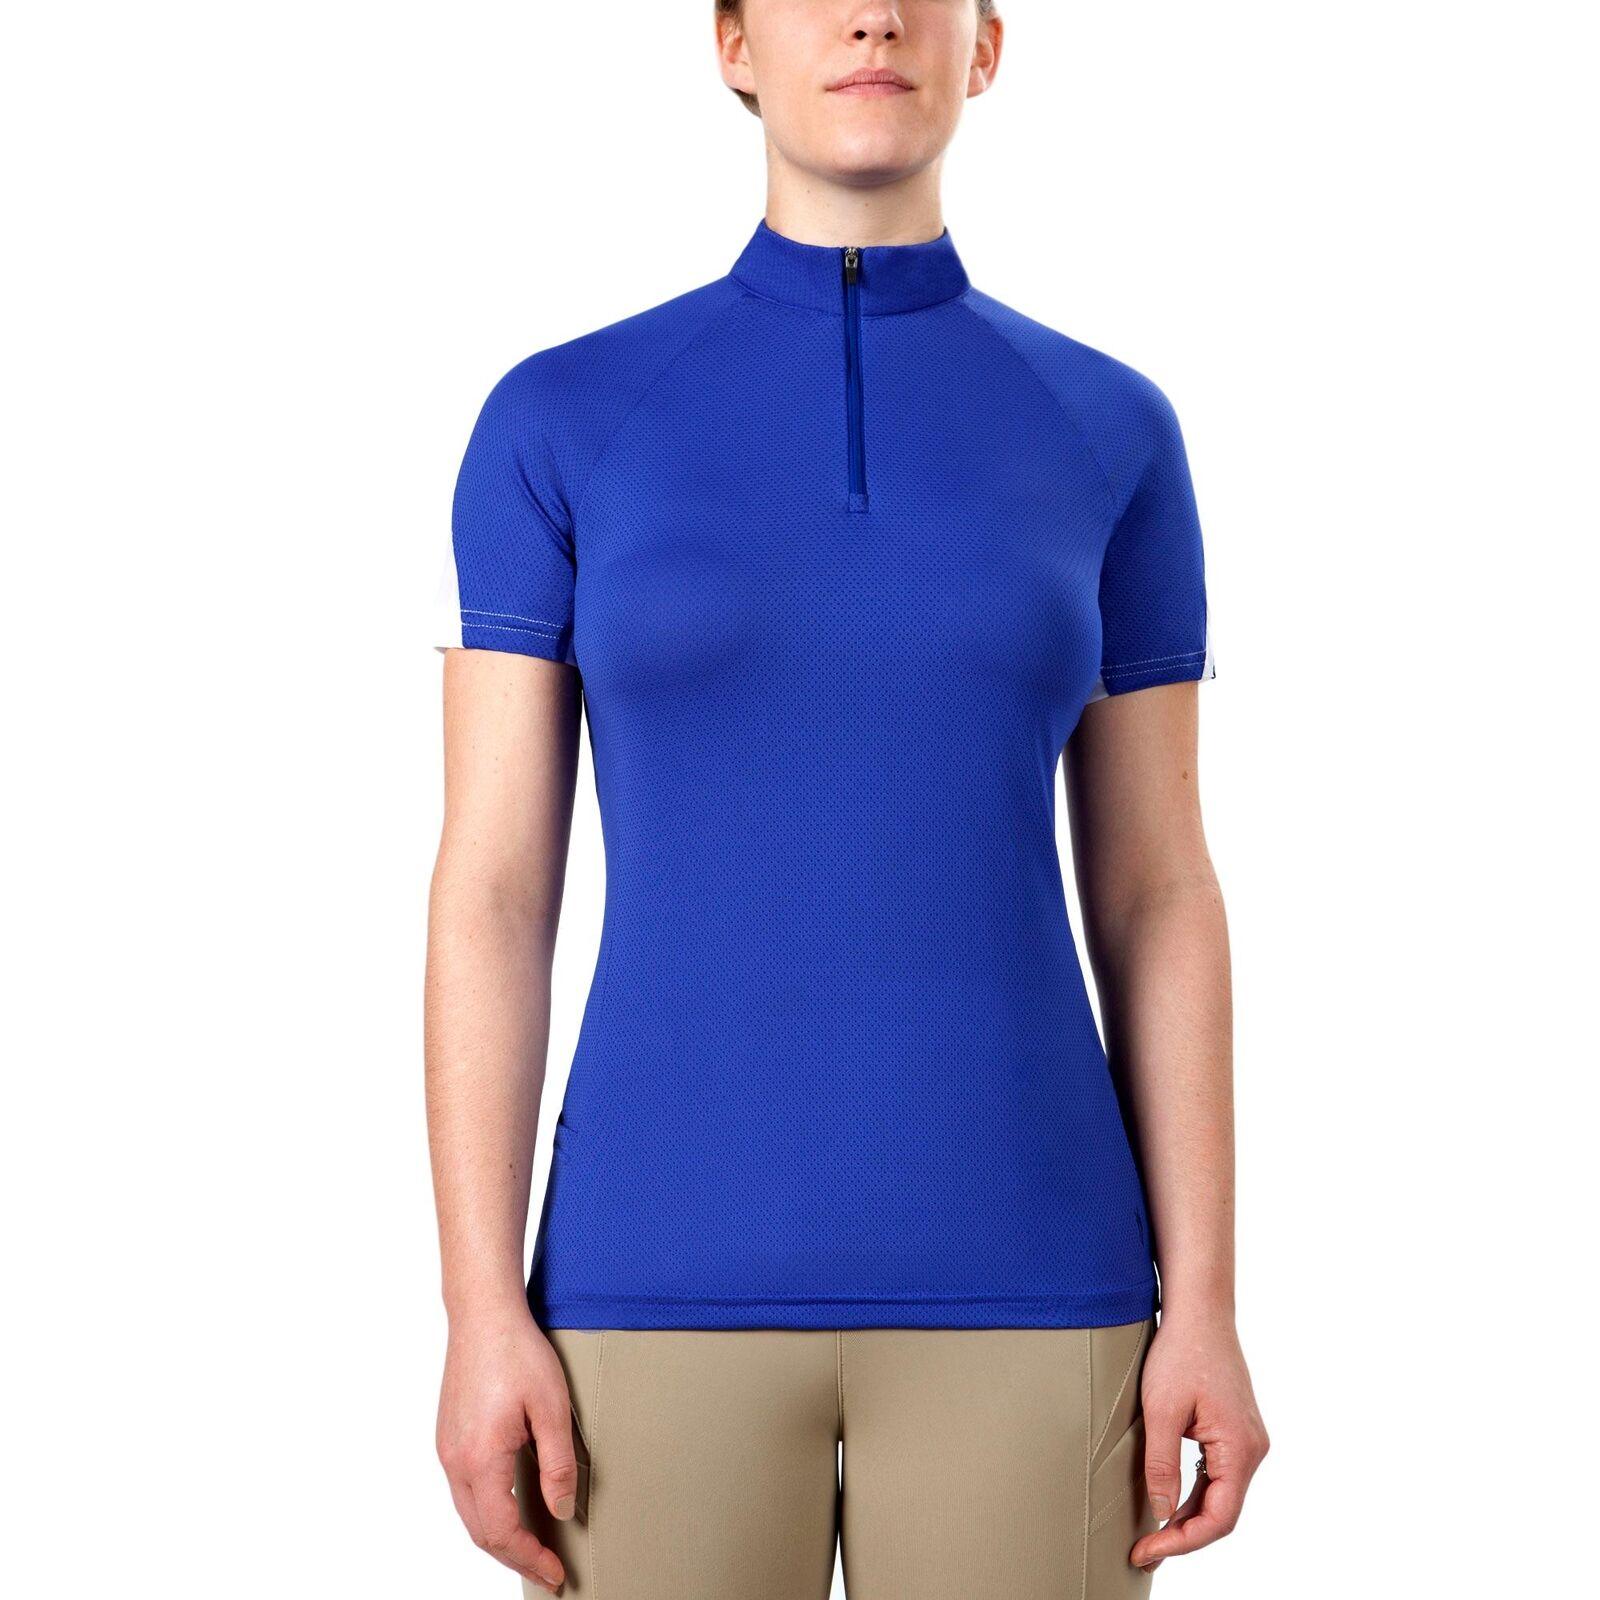 Irideon Wouomo DriLux Icefil Short Sleeve Lightweight Jersey Riding Shirt